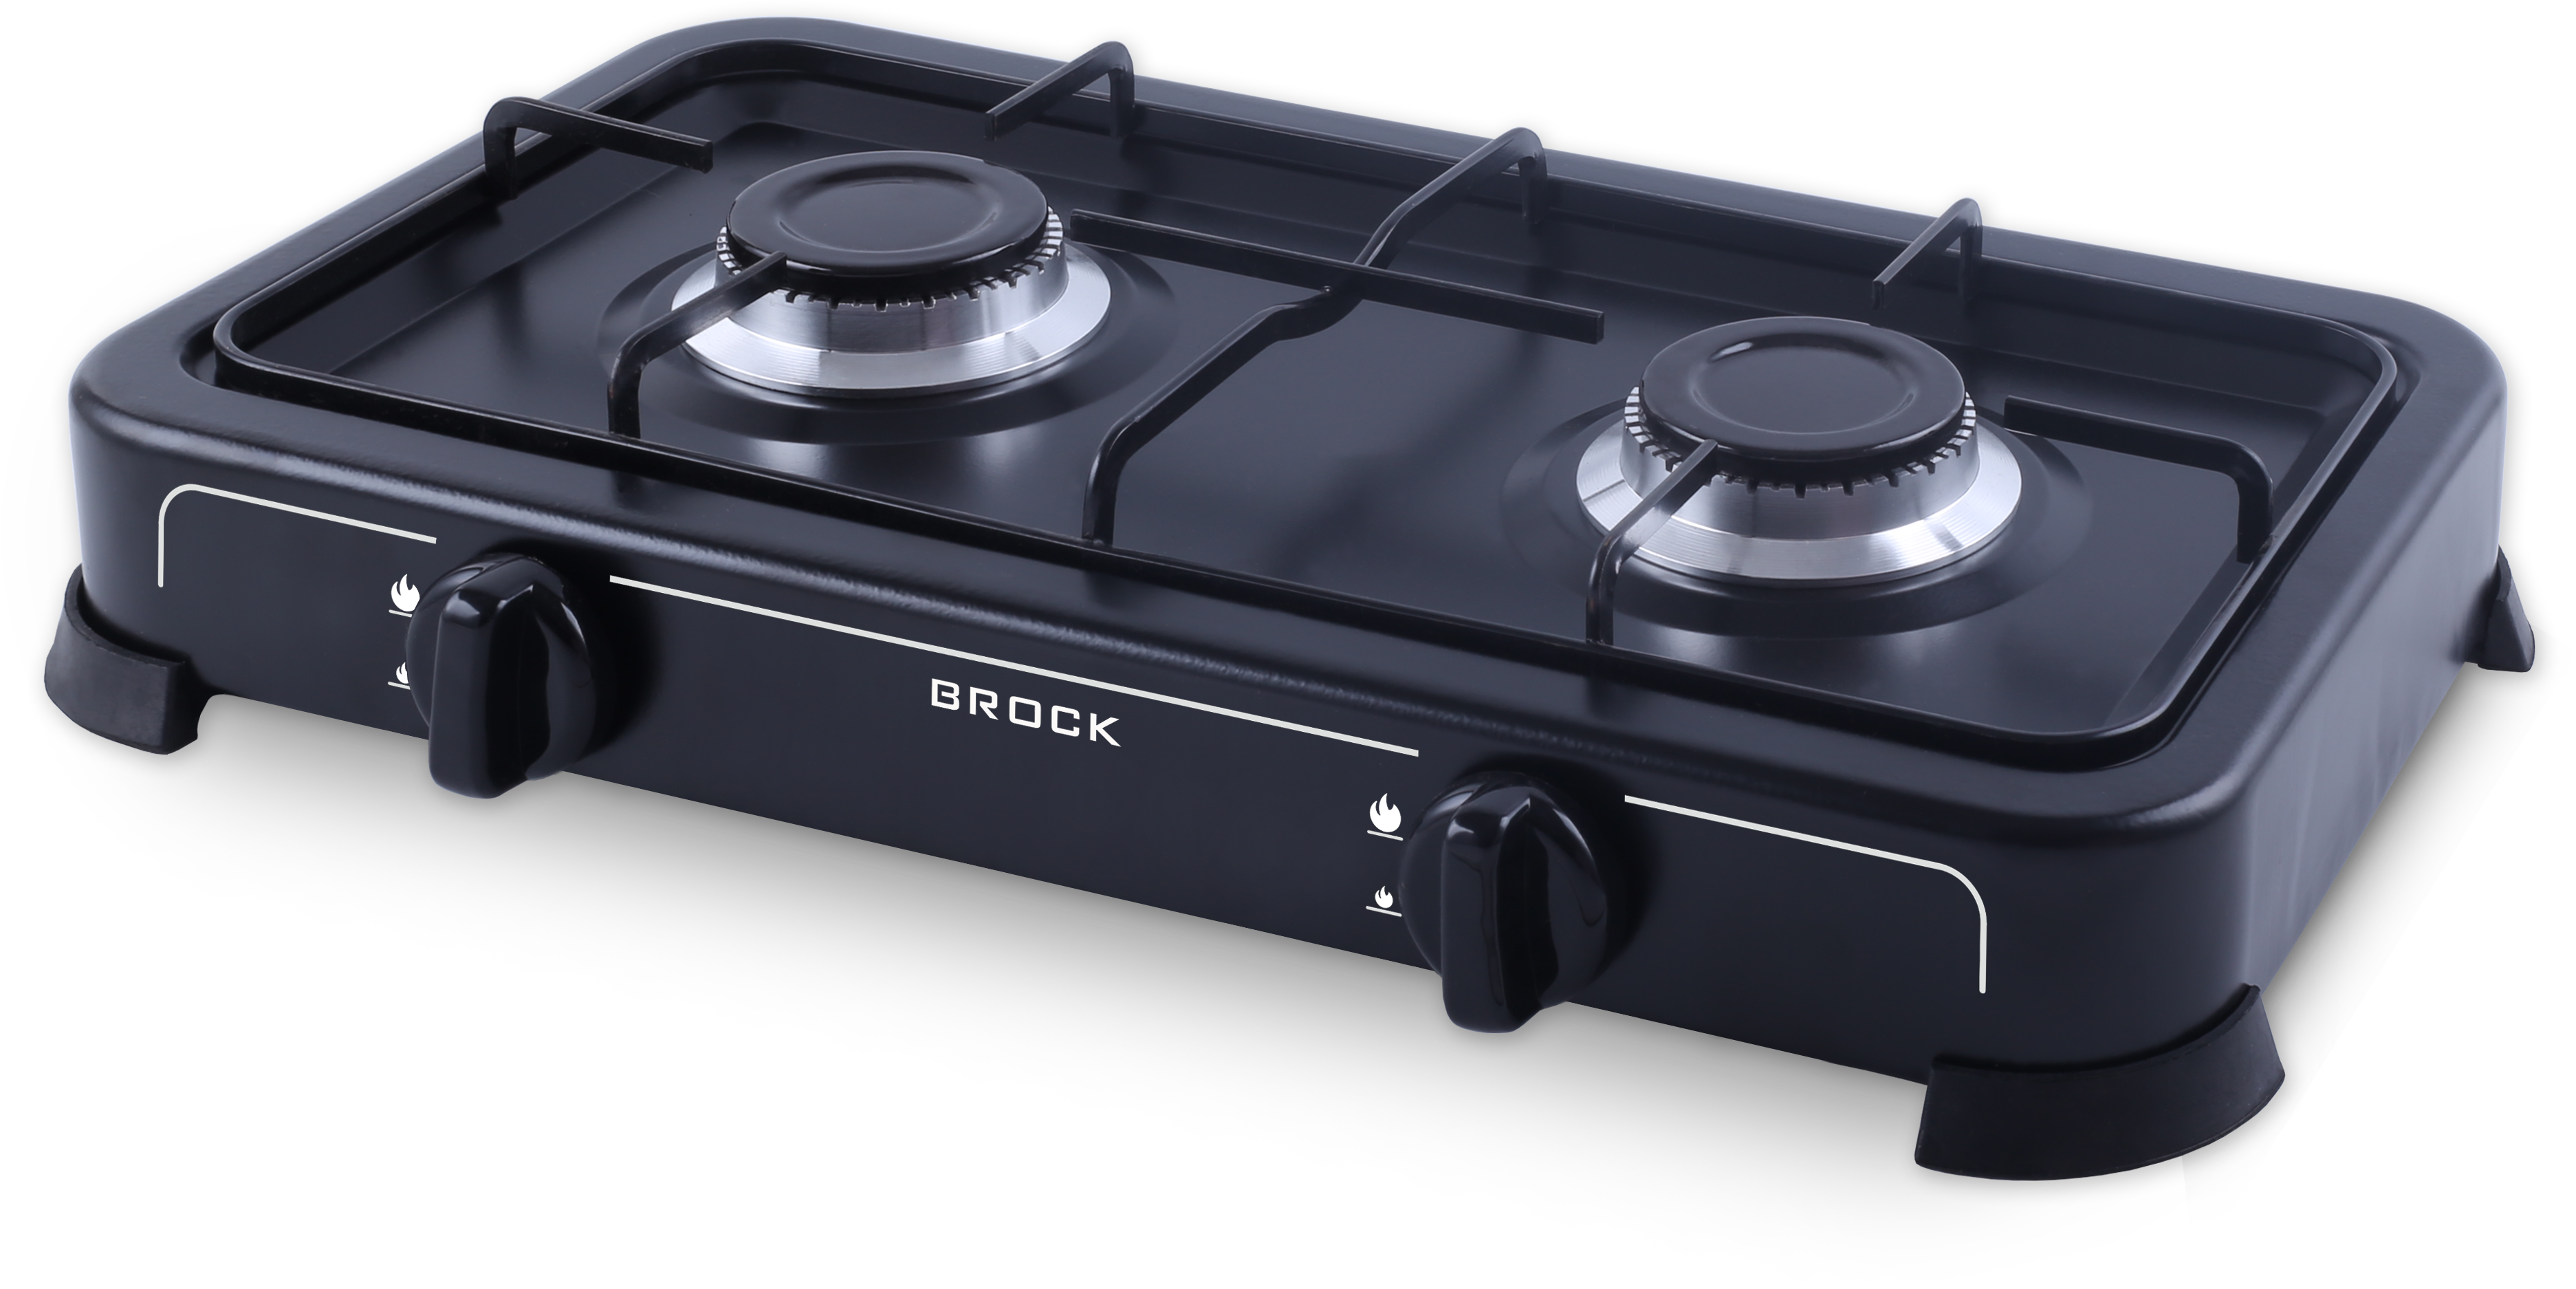 Brock Electronics GS 2002 BK plīts virsma